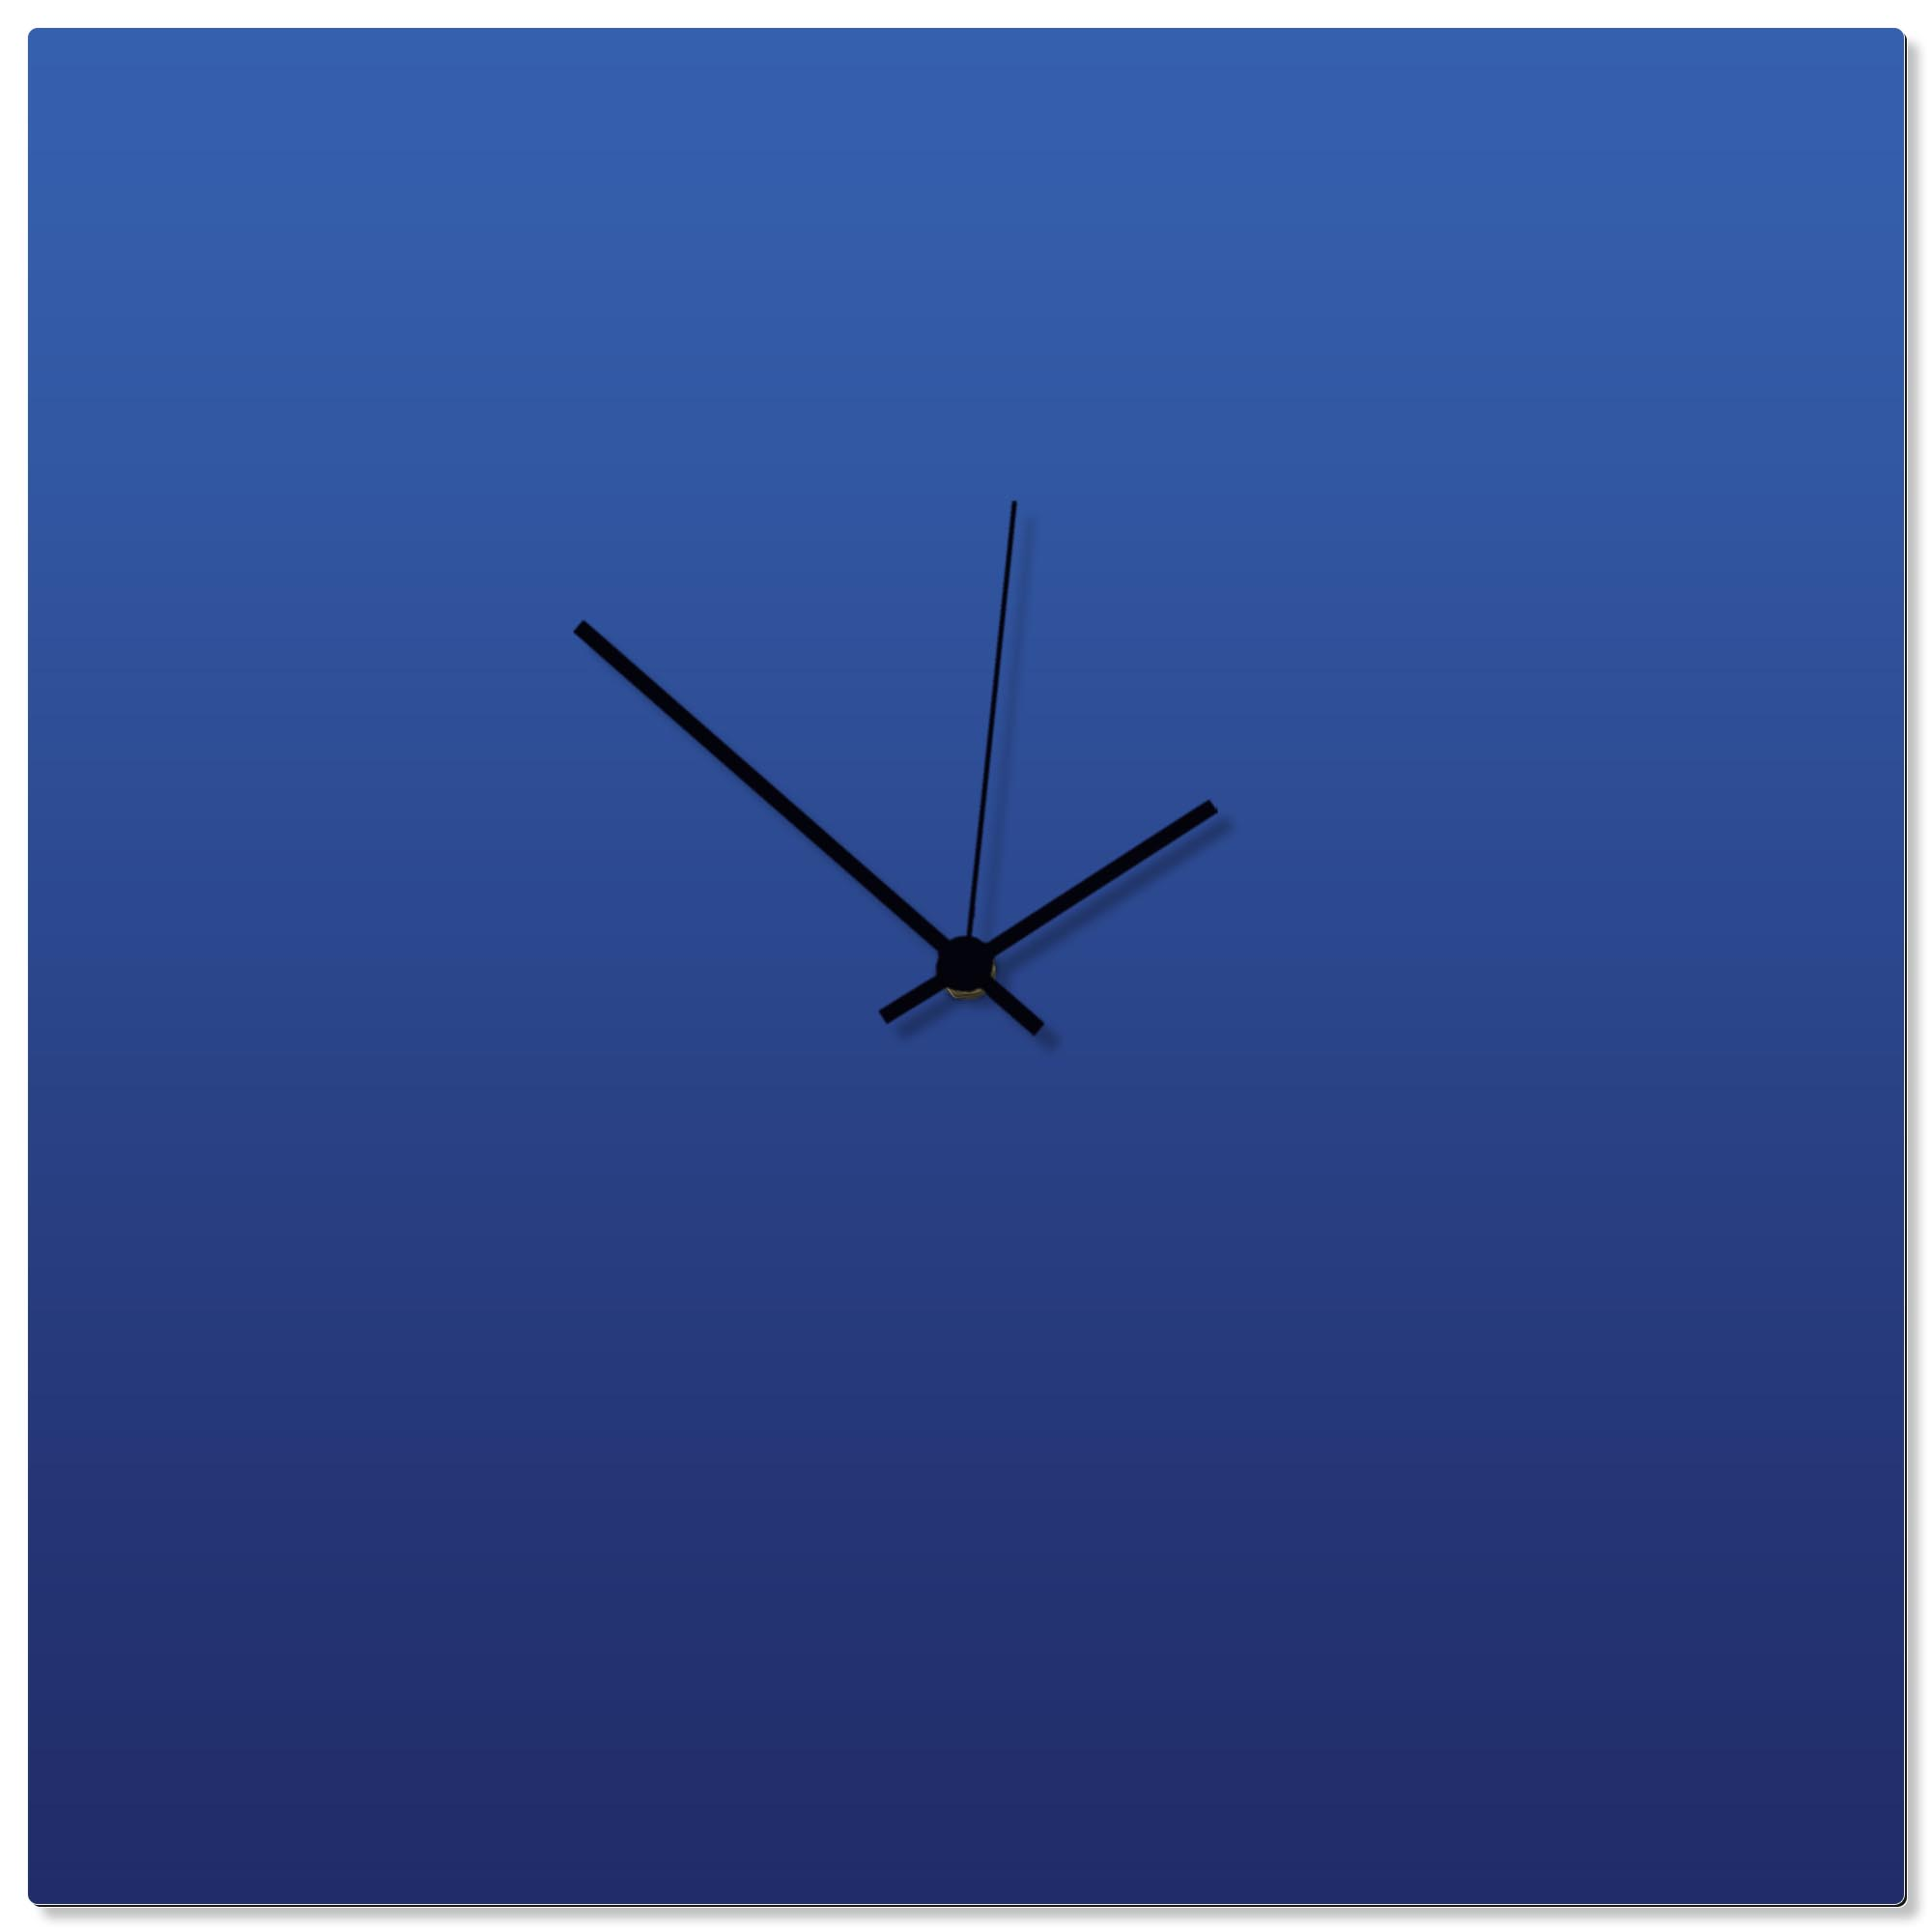 Blueout Black Square Clock Large 23x23in. Aluminum Polymetal